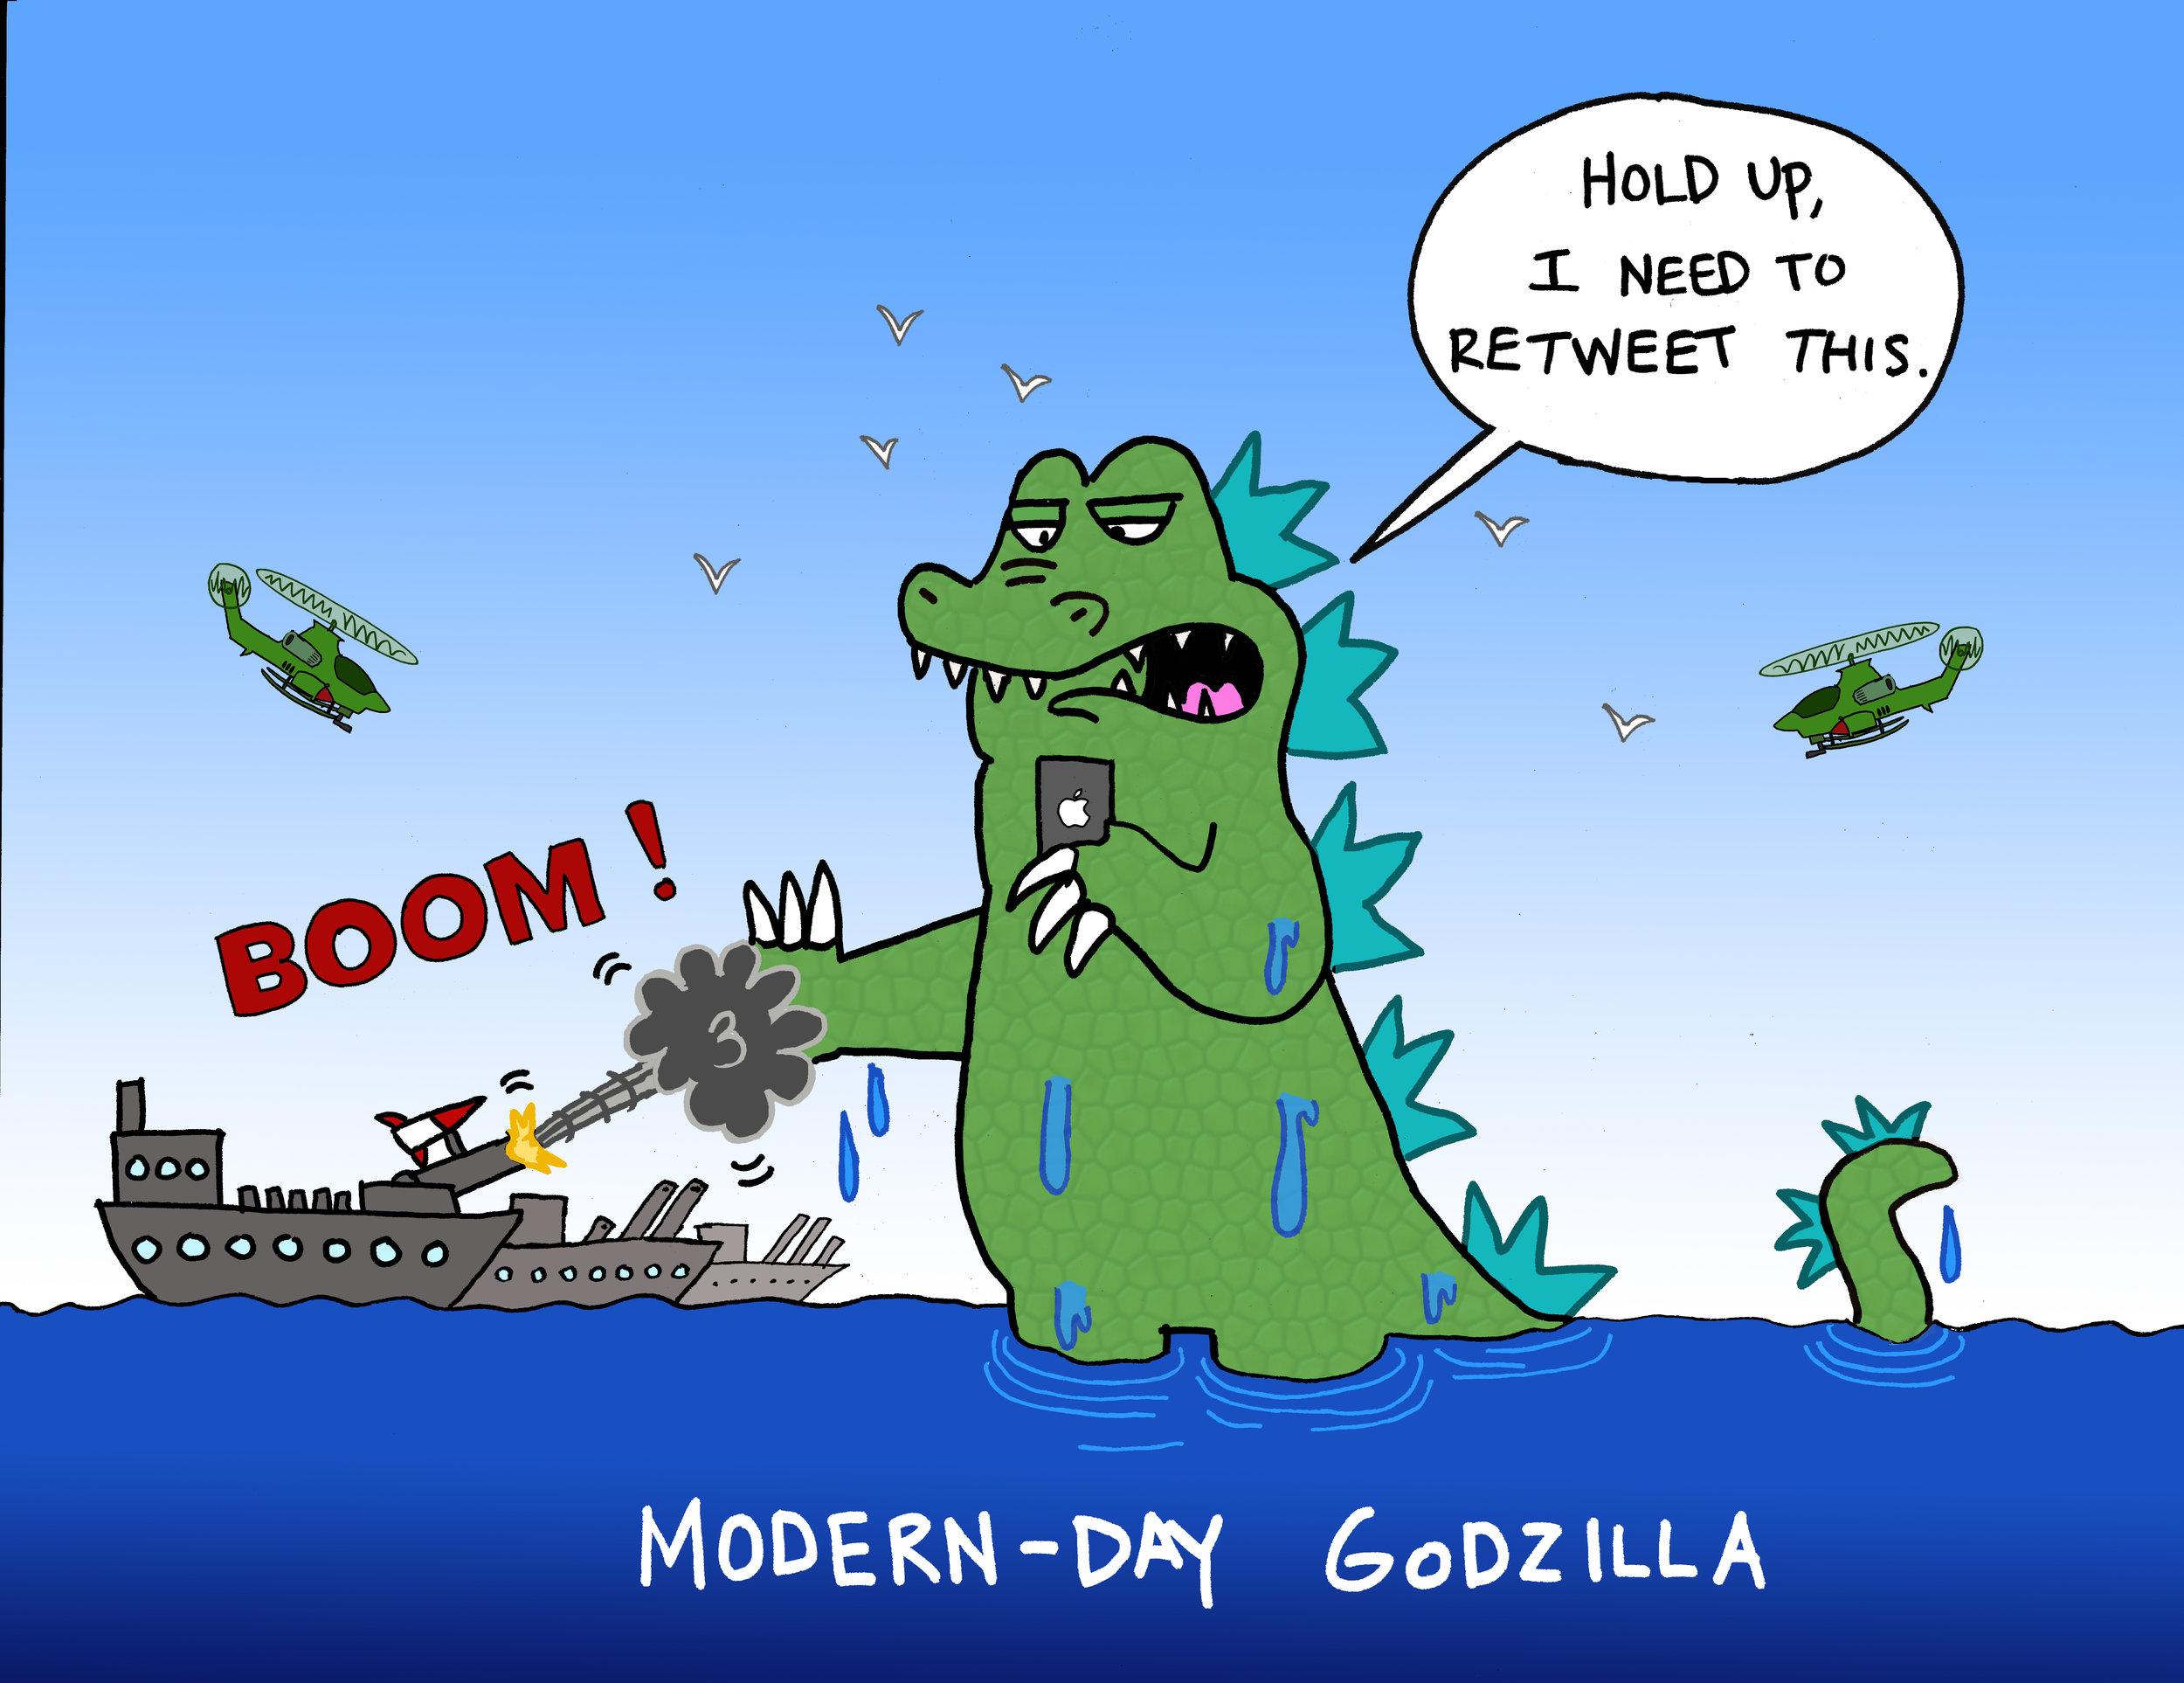 GodzillaRedone.jpg